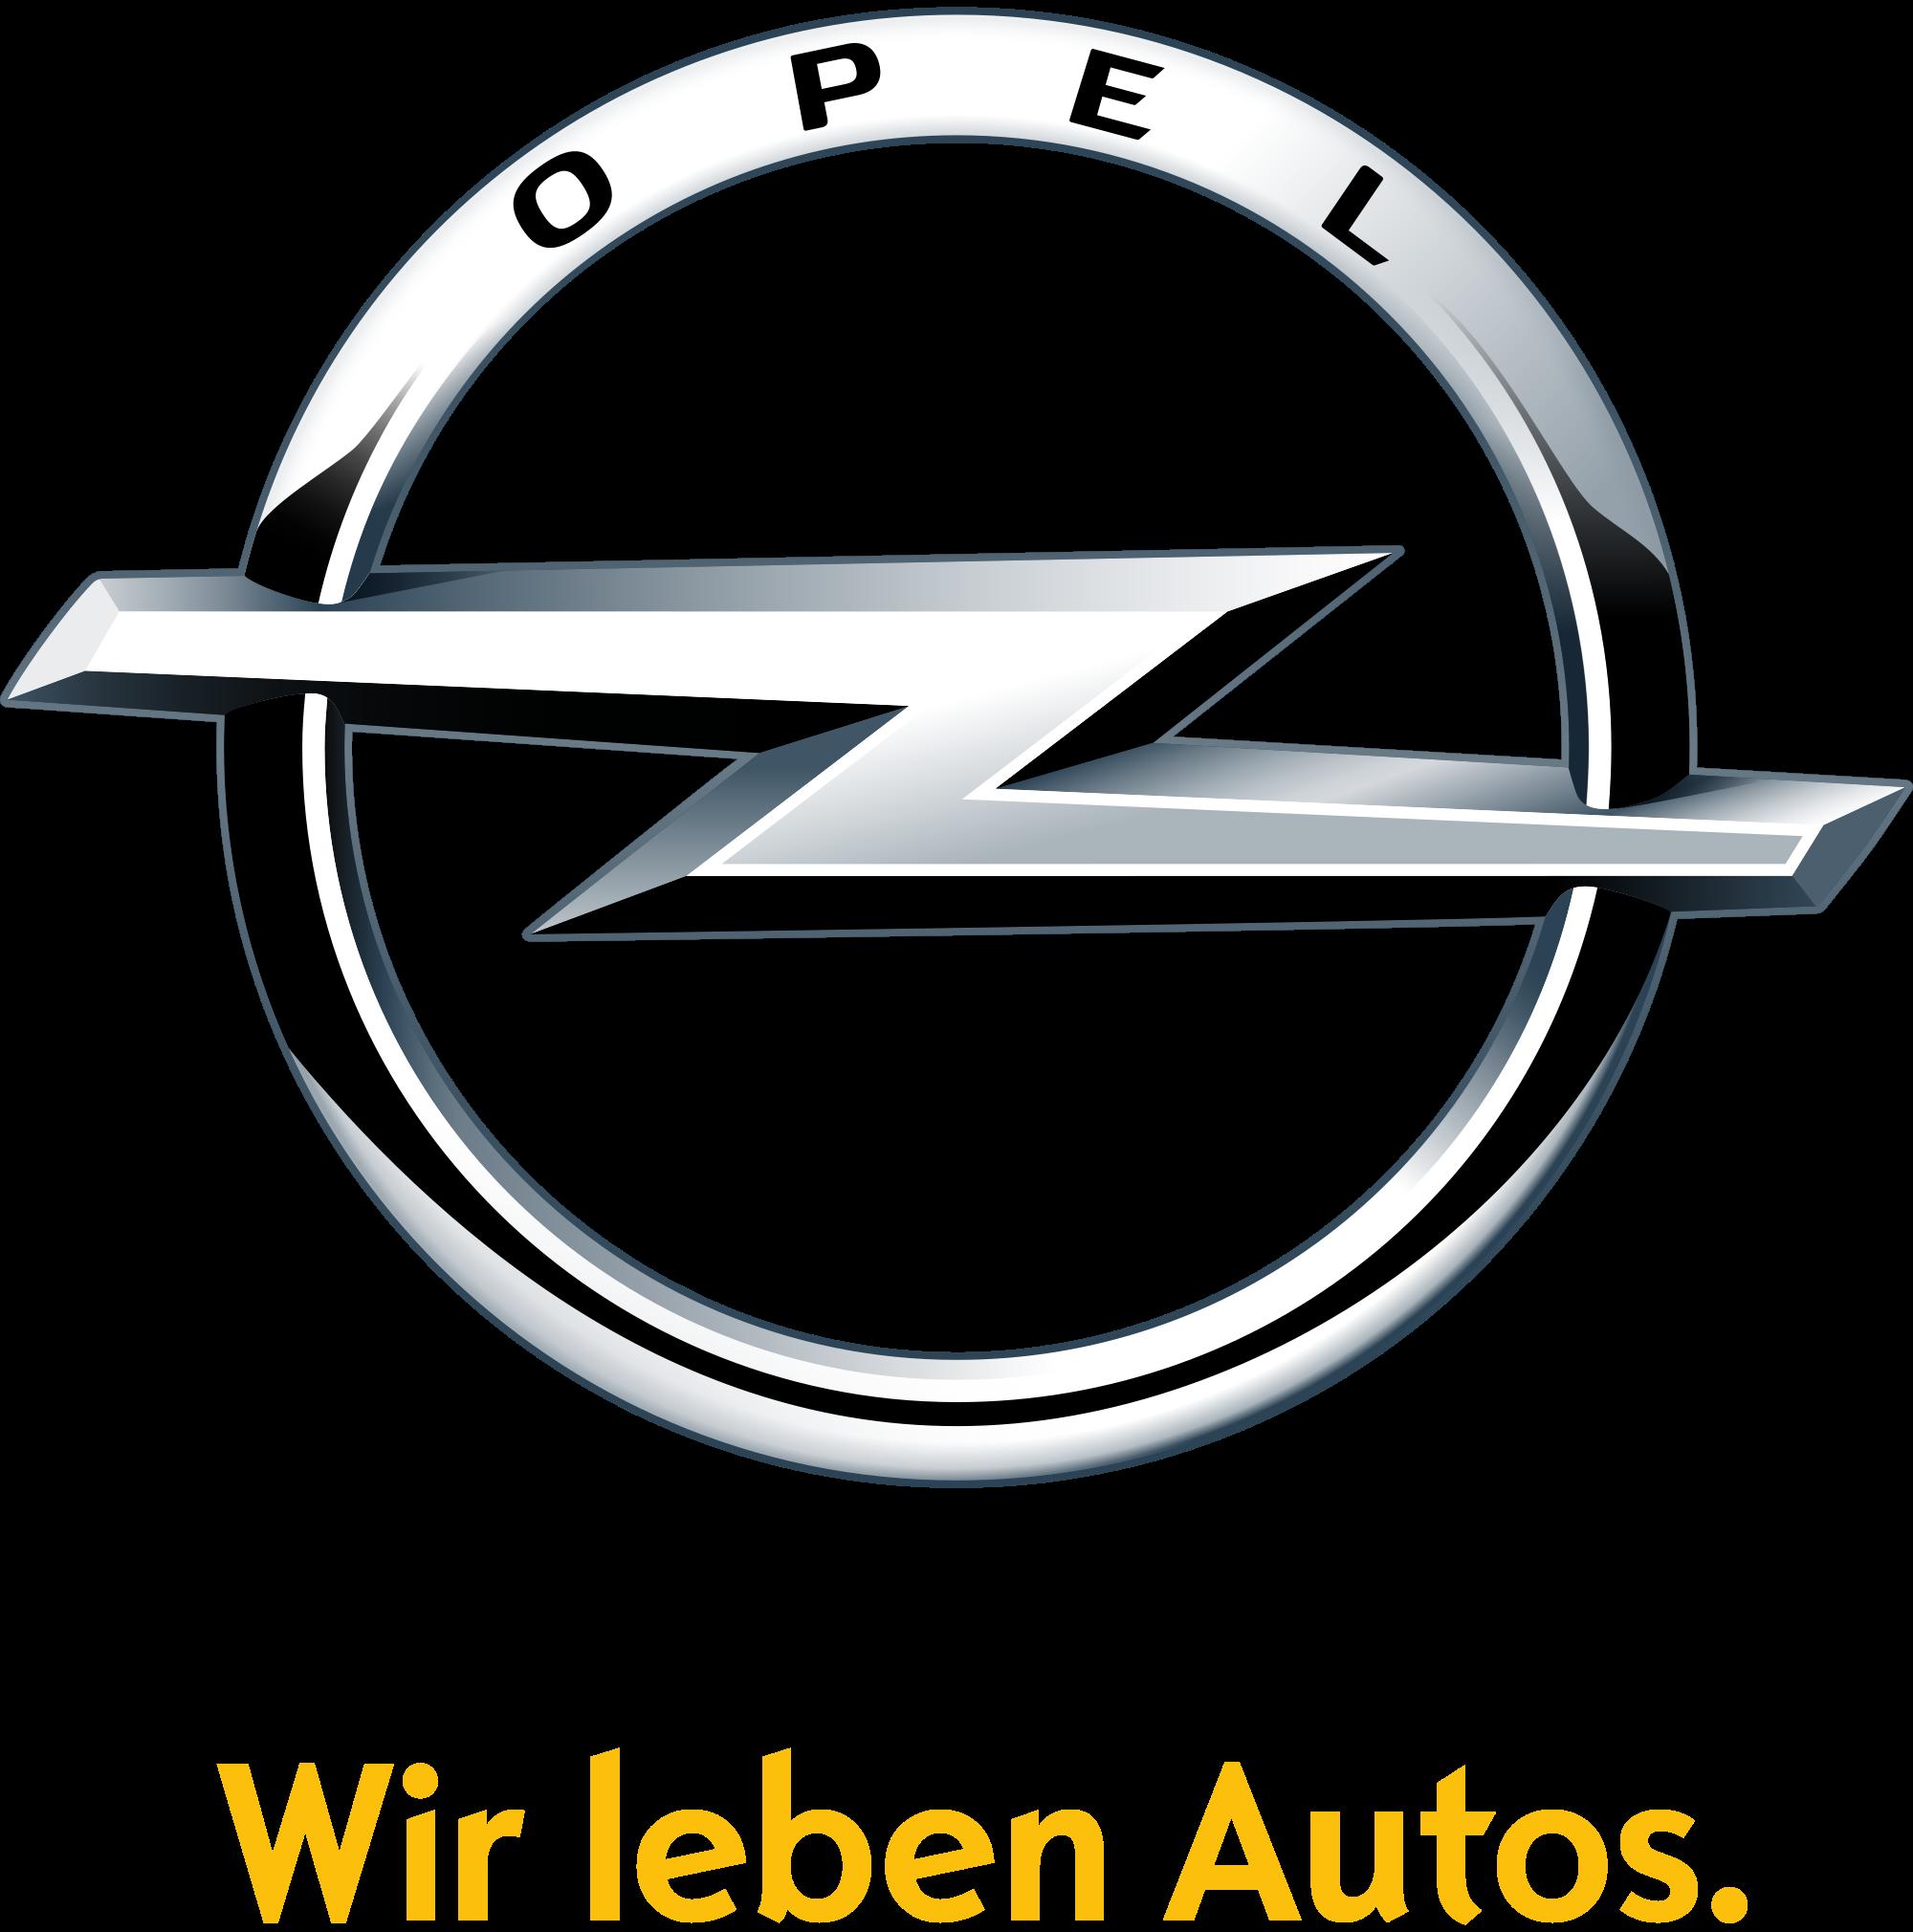 OPEL CORSA 1.4 TURBO S&S SELECTIVE 100cv Gasolina 5 puertas Color Gris / Oferta 10.490€*/